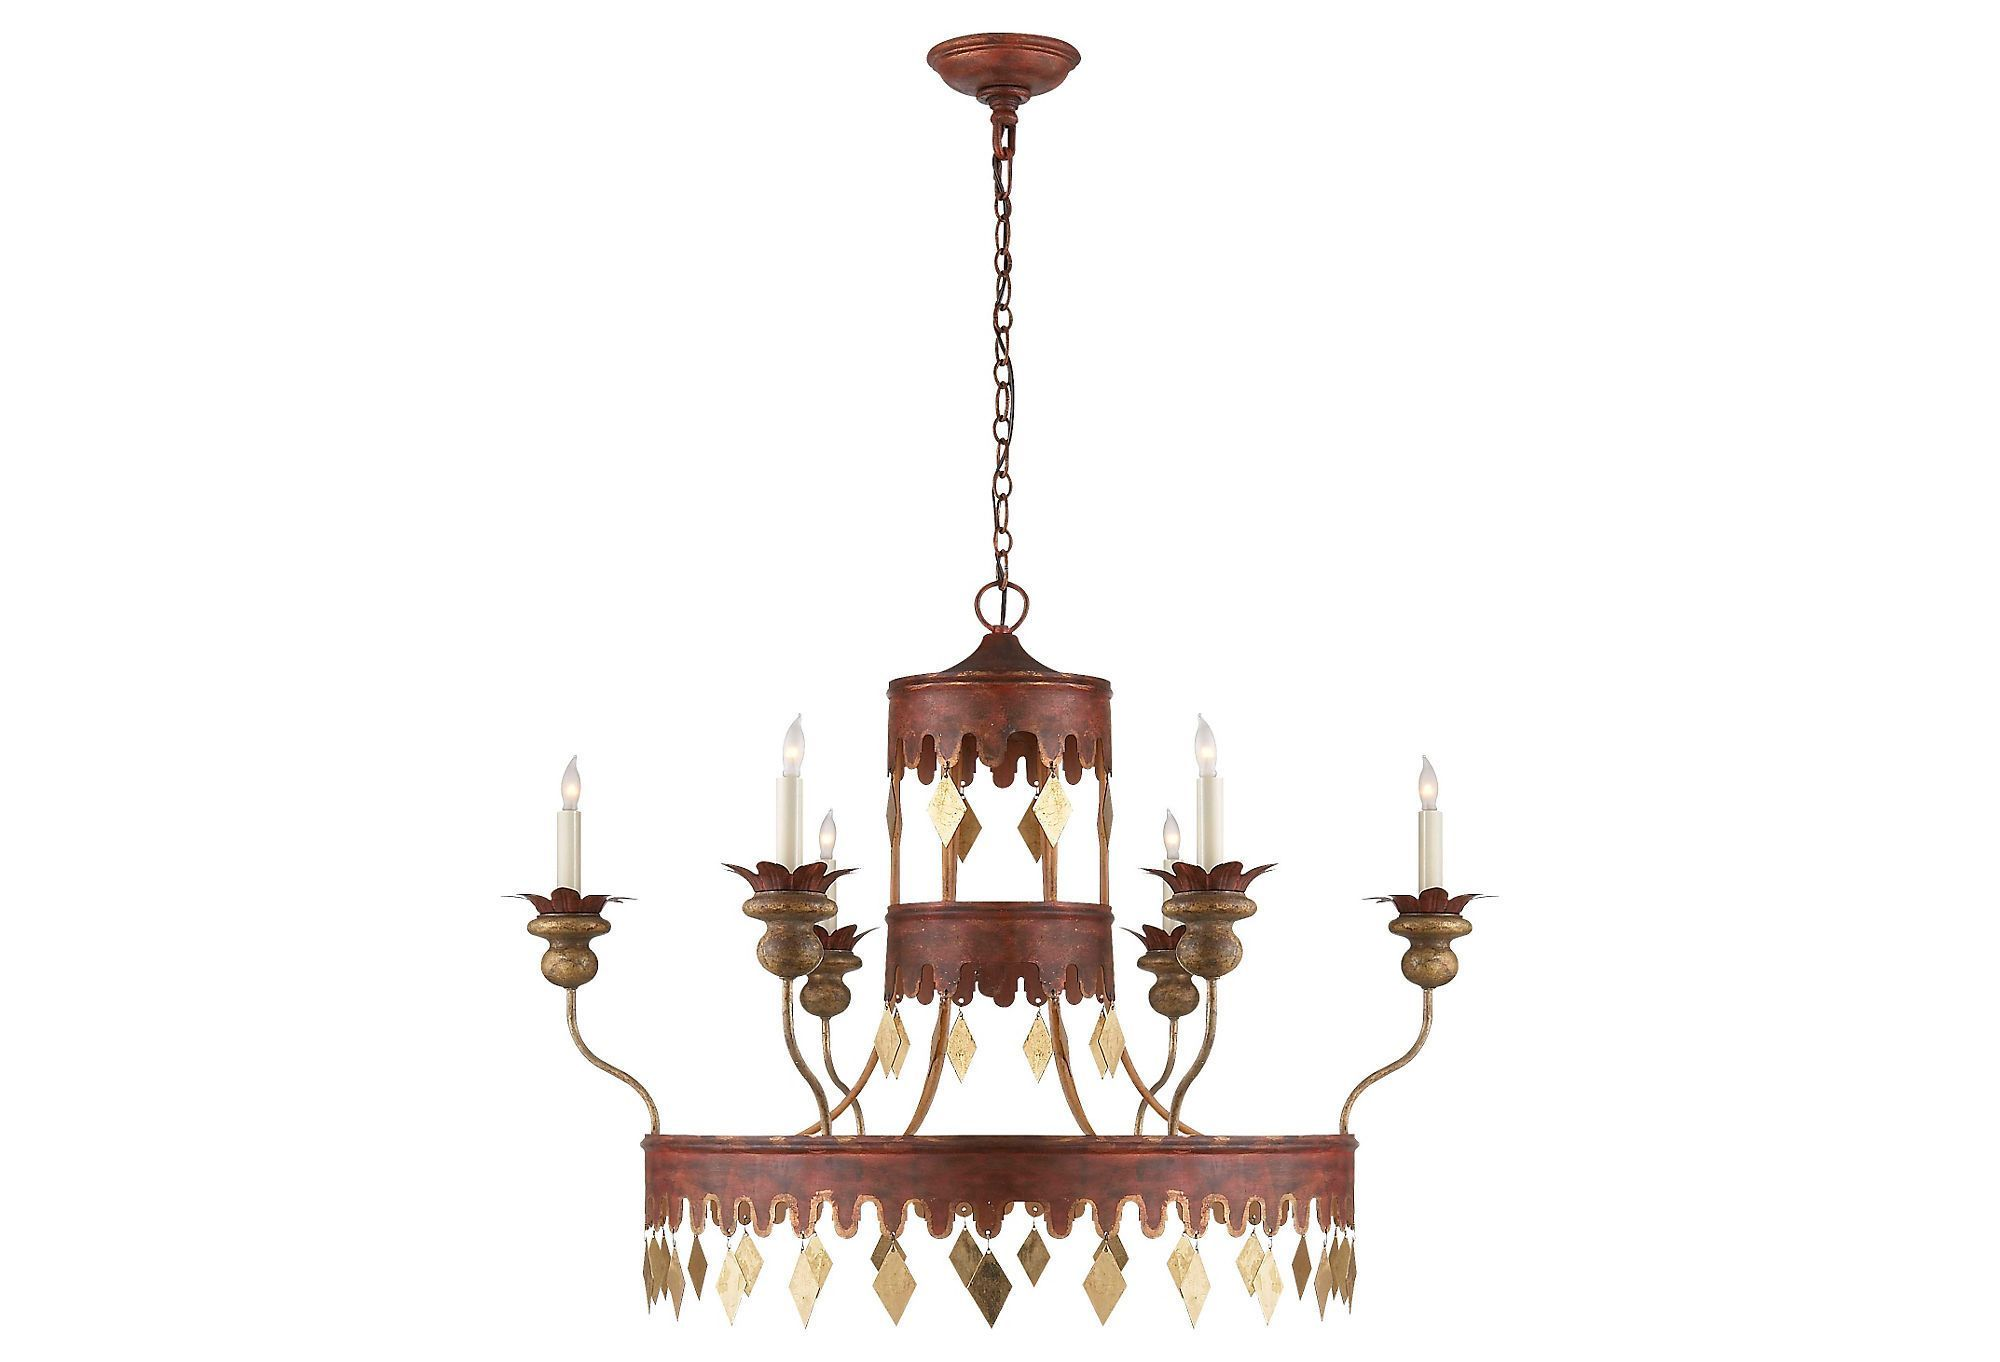 Xavier 6 light chandelier redgold tole all aglow one kings xavier 6 light chandelier redgold tole all aglow one kings arubaitofo Images